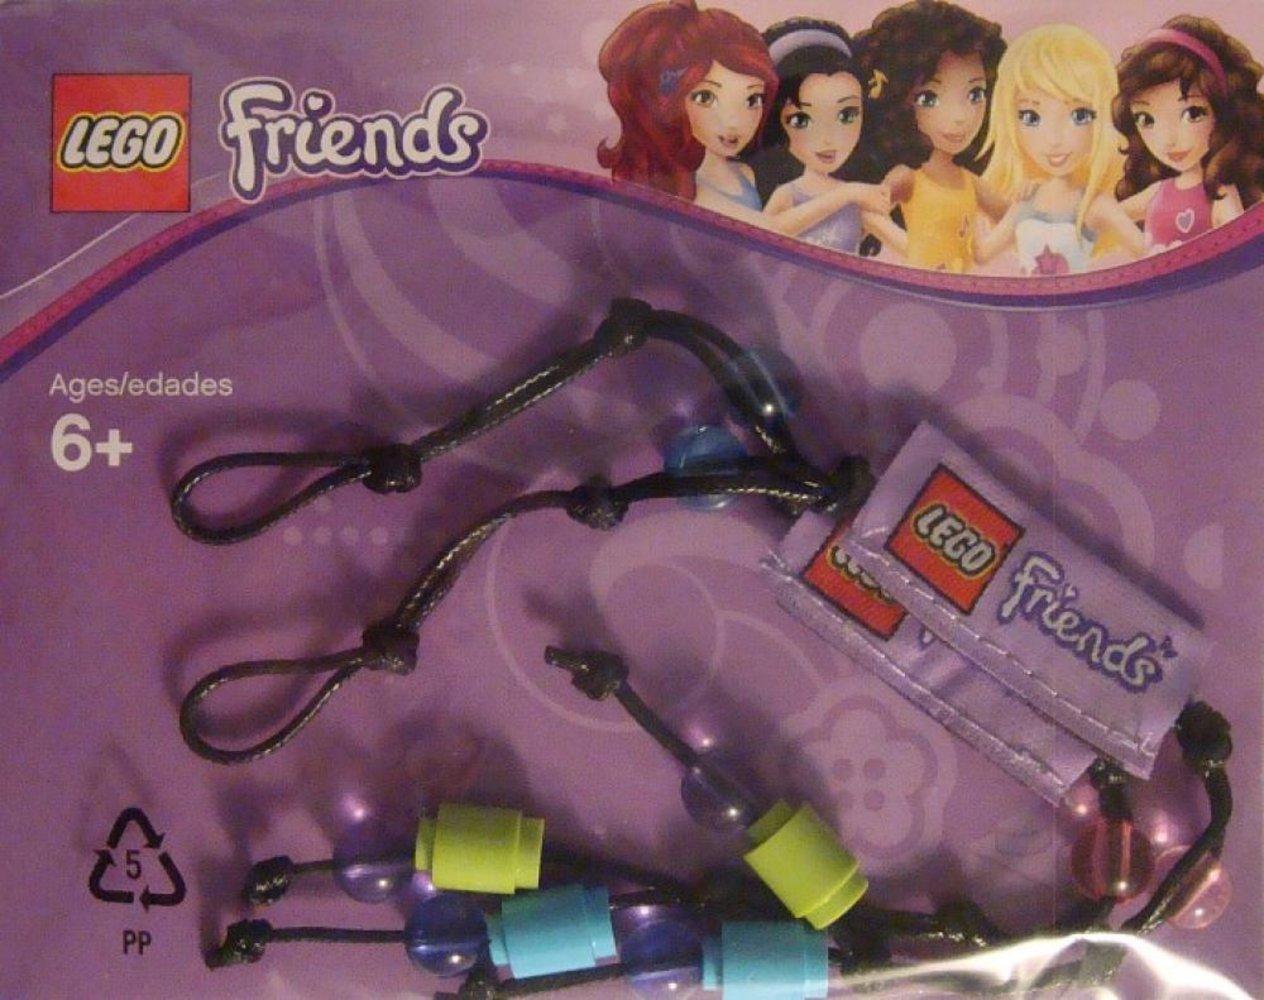 Friends - Bracelets